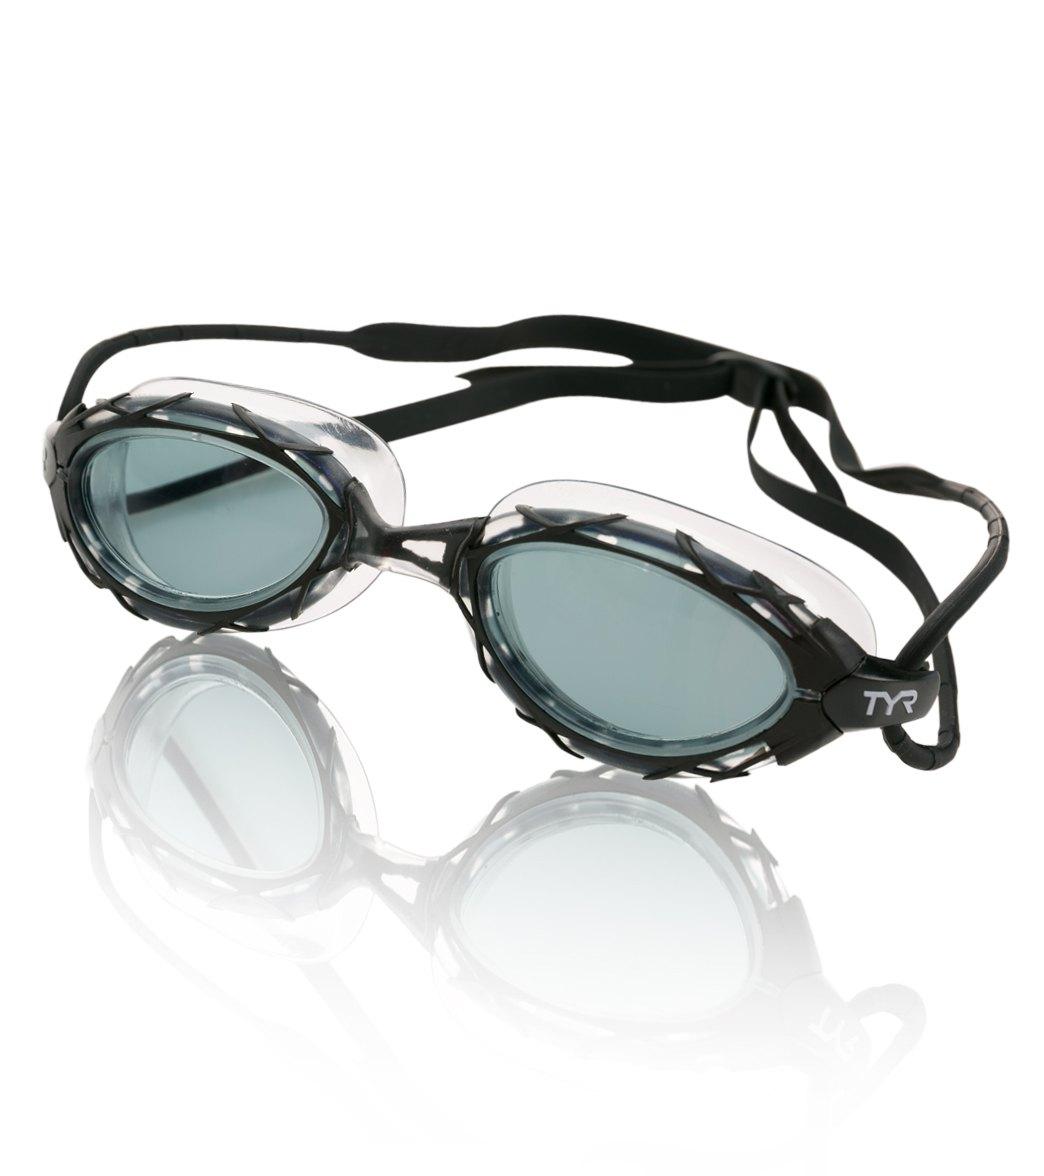 ab06572ad85 TYR Nest Pro Swim Goggle at SwimOutlet.com